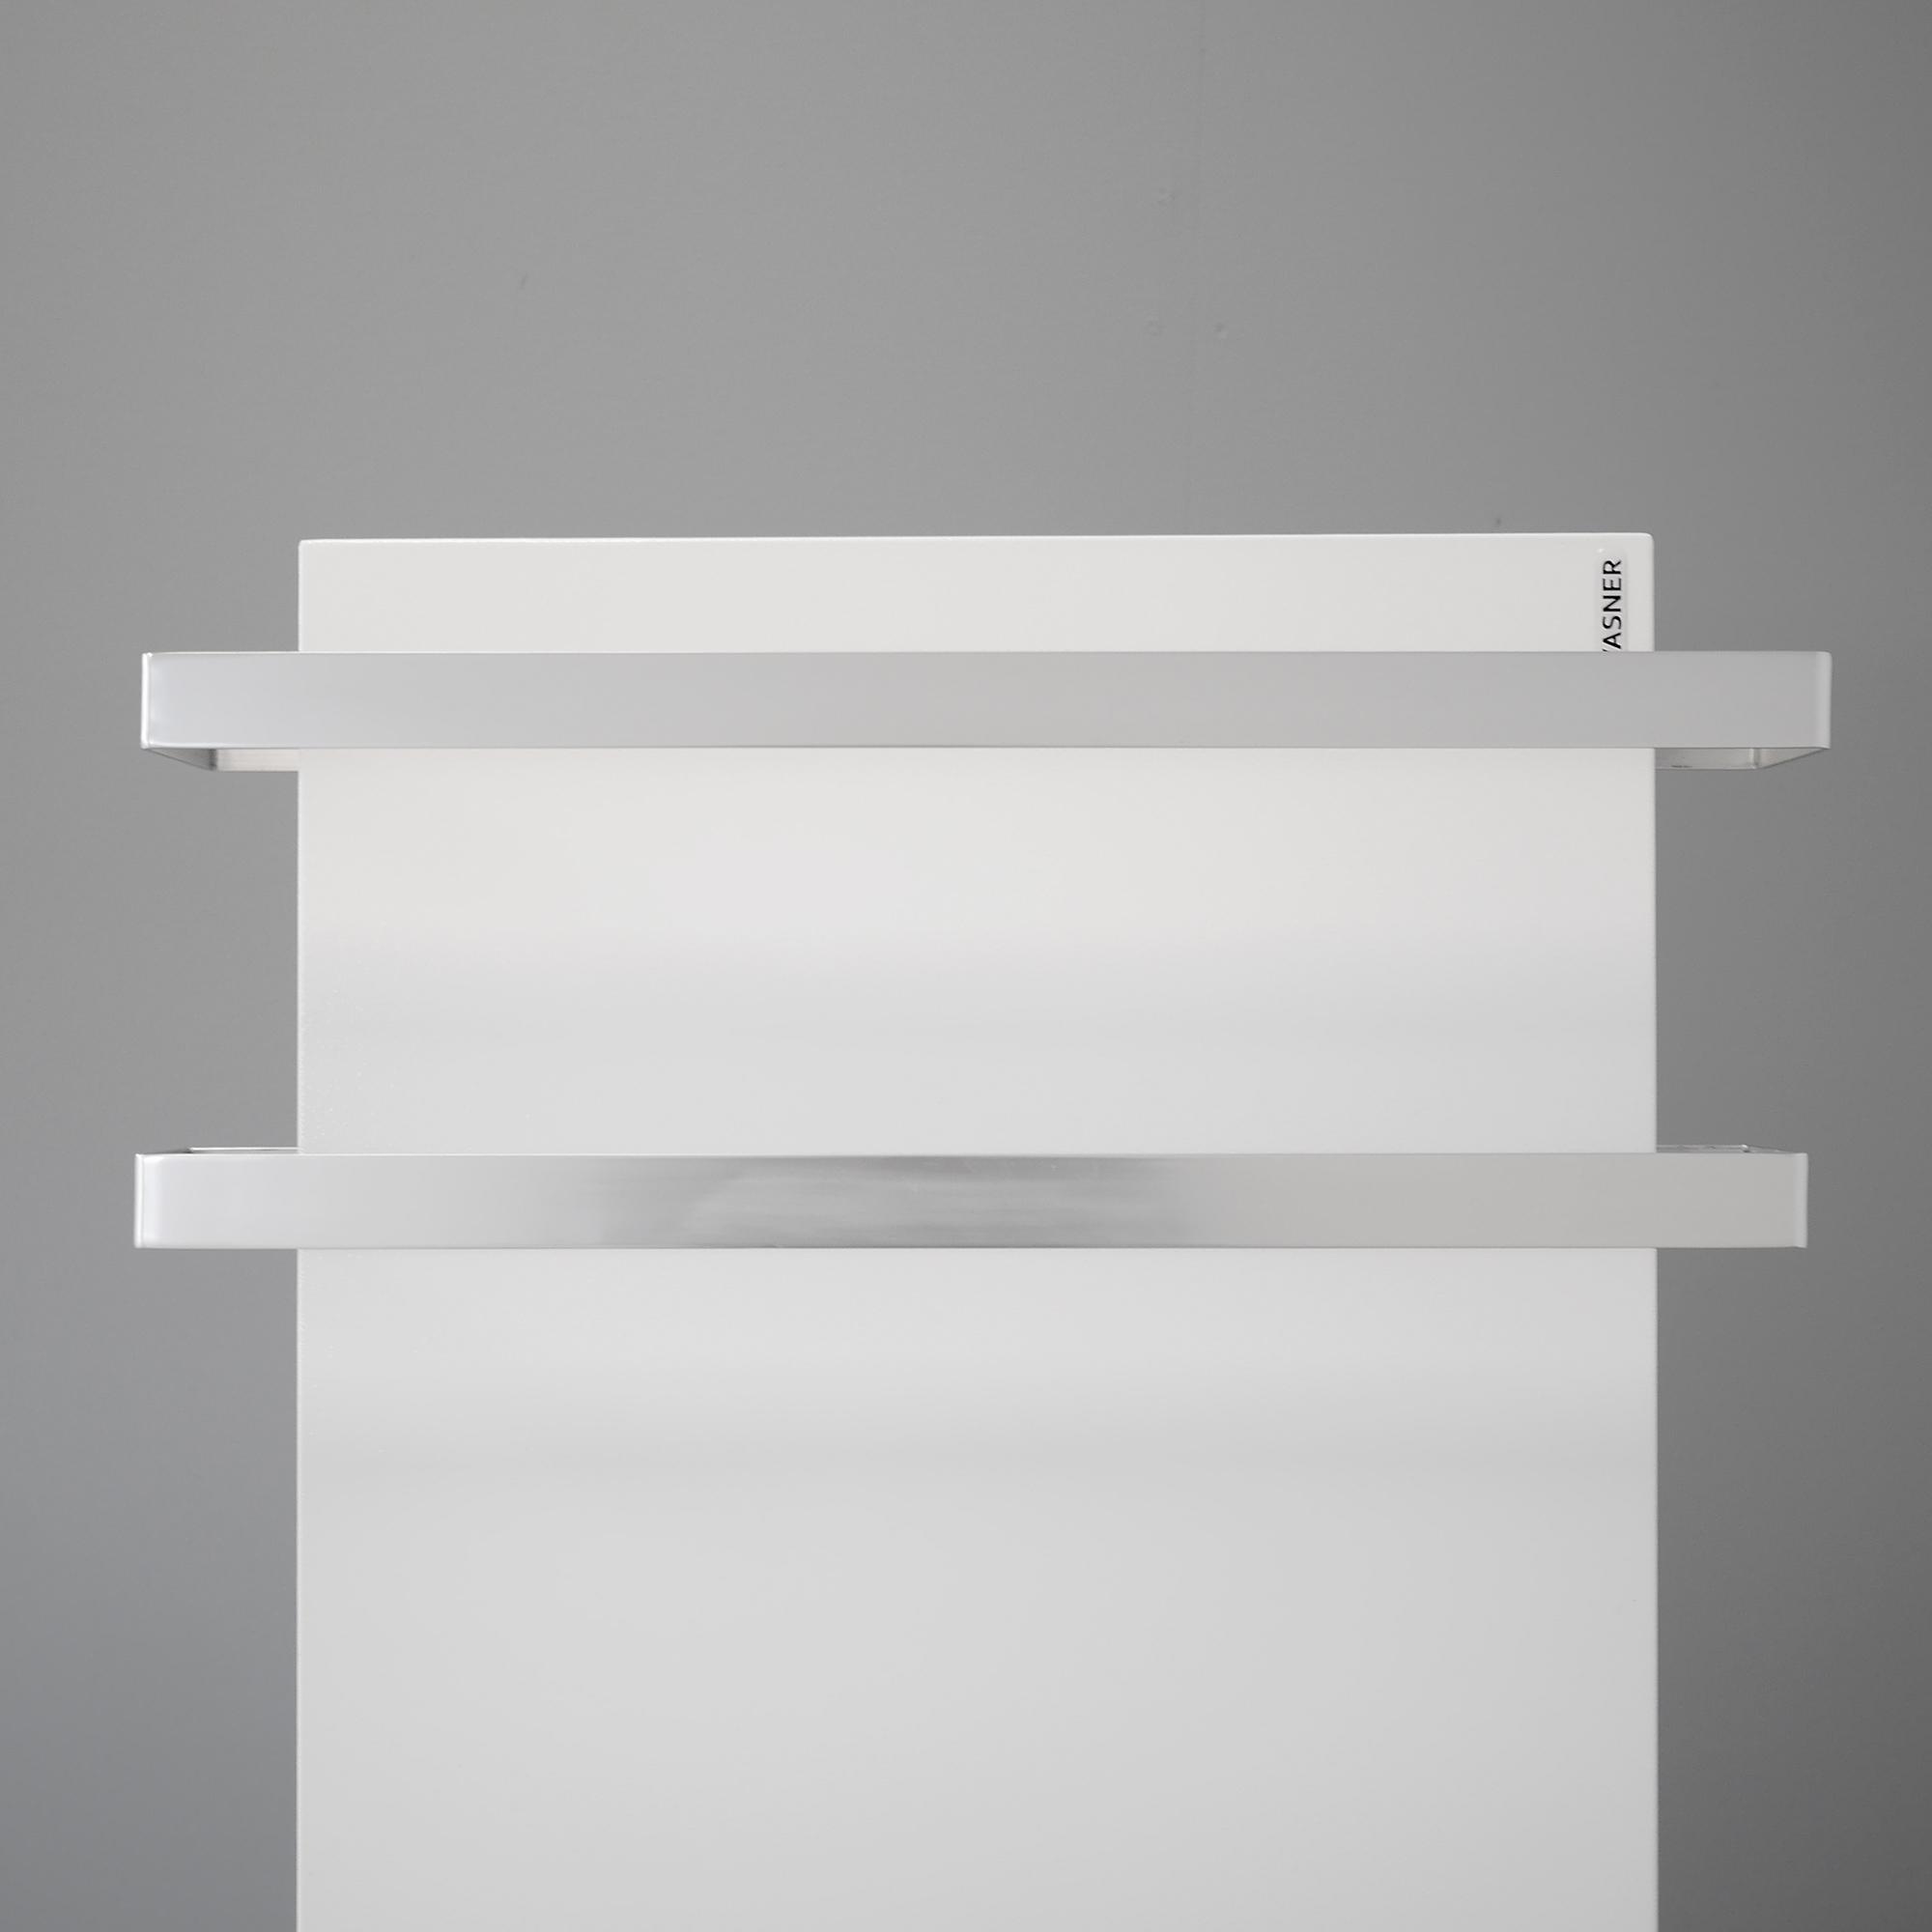 vasner citara m serie infrarot heizplatte aus edlem metall. Black Bedroom Furniture Sets. Home Design Ideas